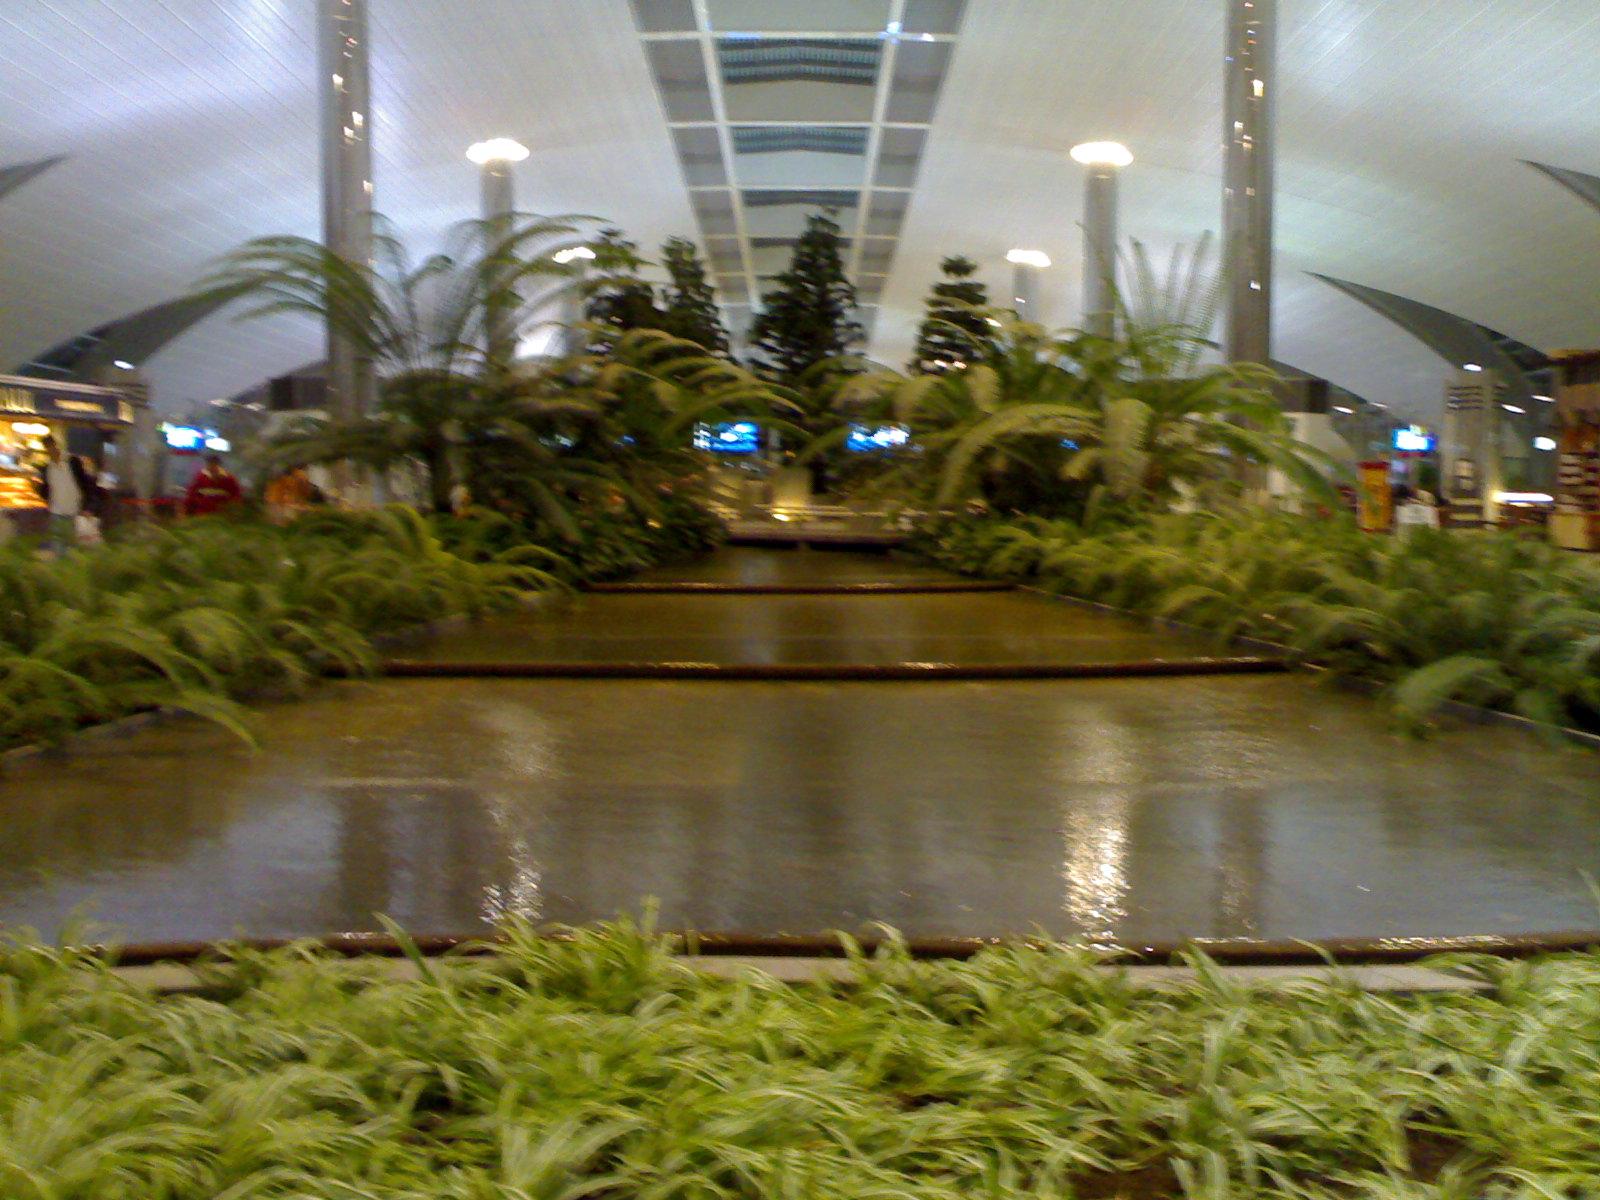 Sanabis (Bahrain) Daily Photo: Indoor Garden at Terminal 3 Dubai Airport